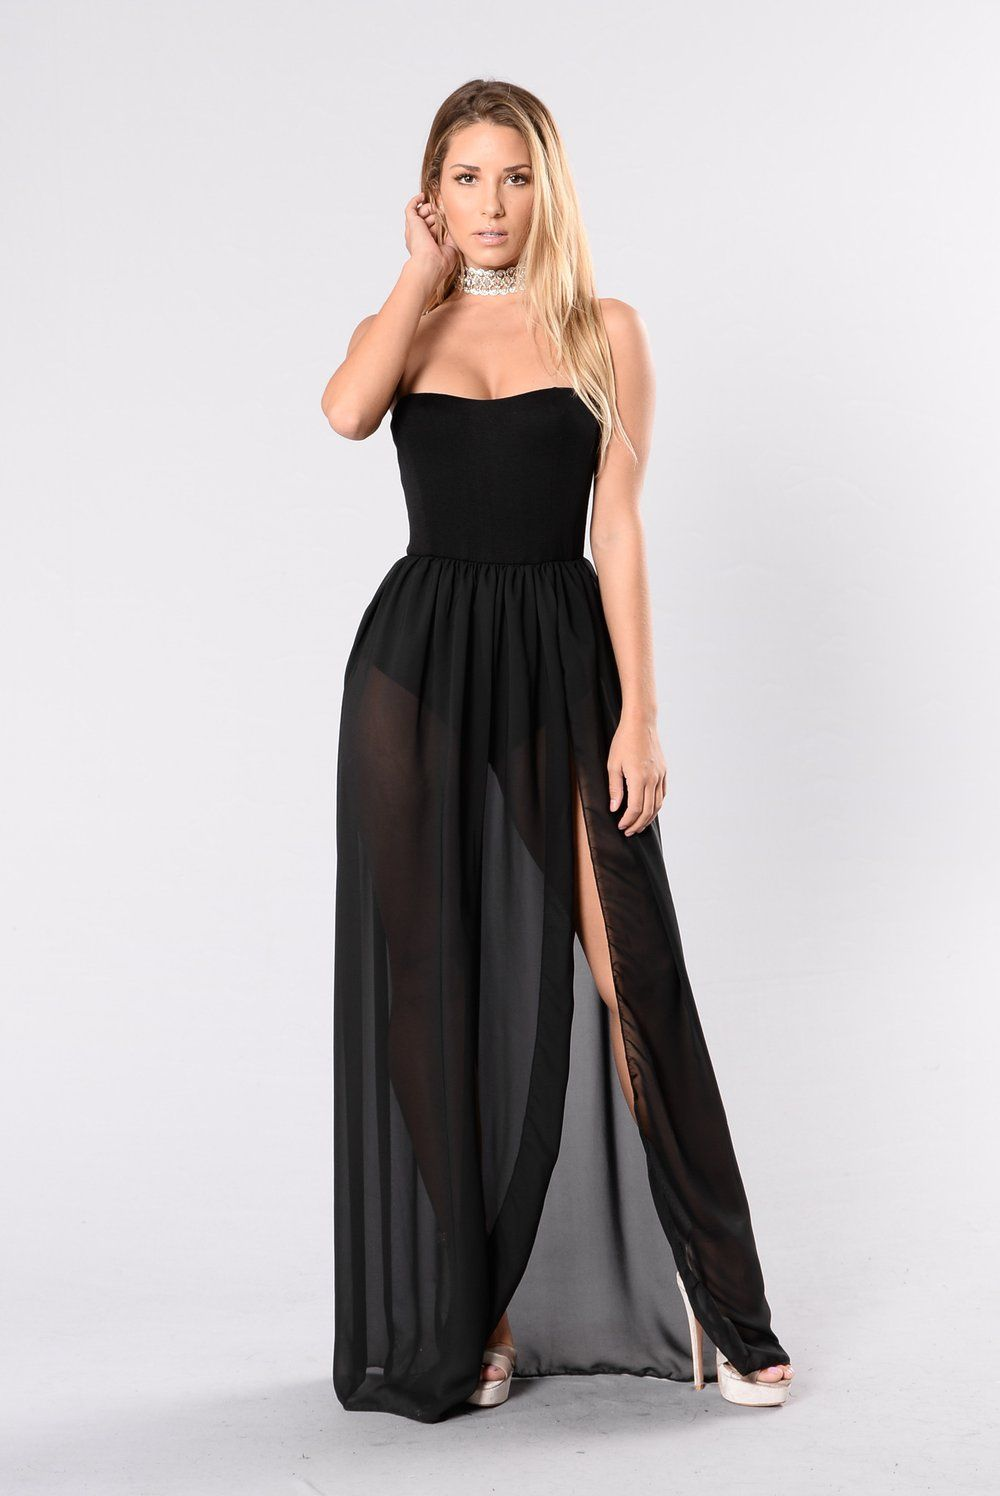 Exhibit a dress black dresses white strapless maxi